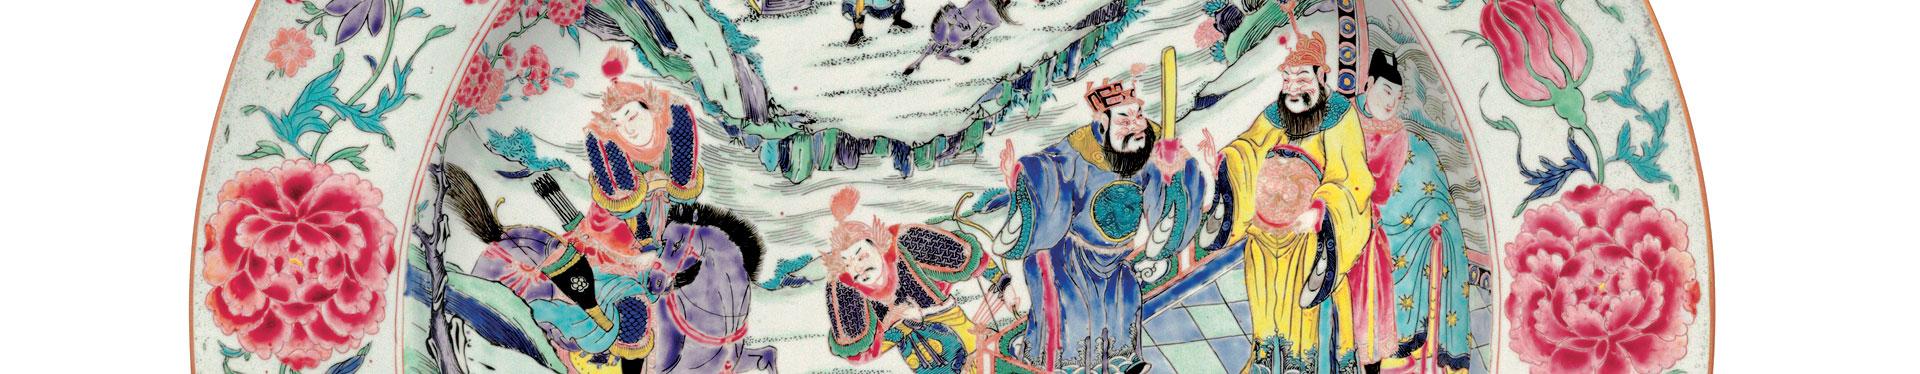 chinese-export-art-christies-banner-op1_117_1_20171212123801.jpg